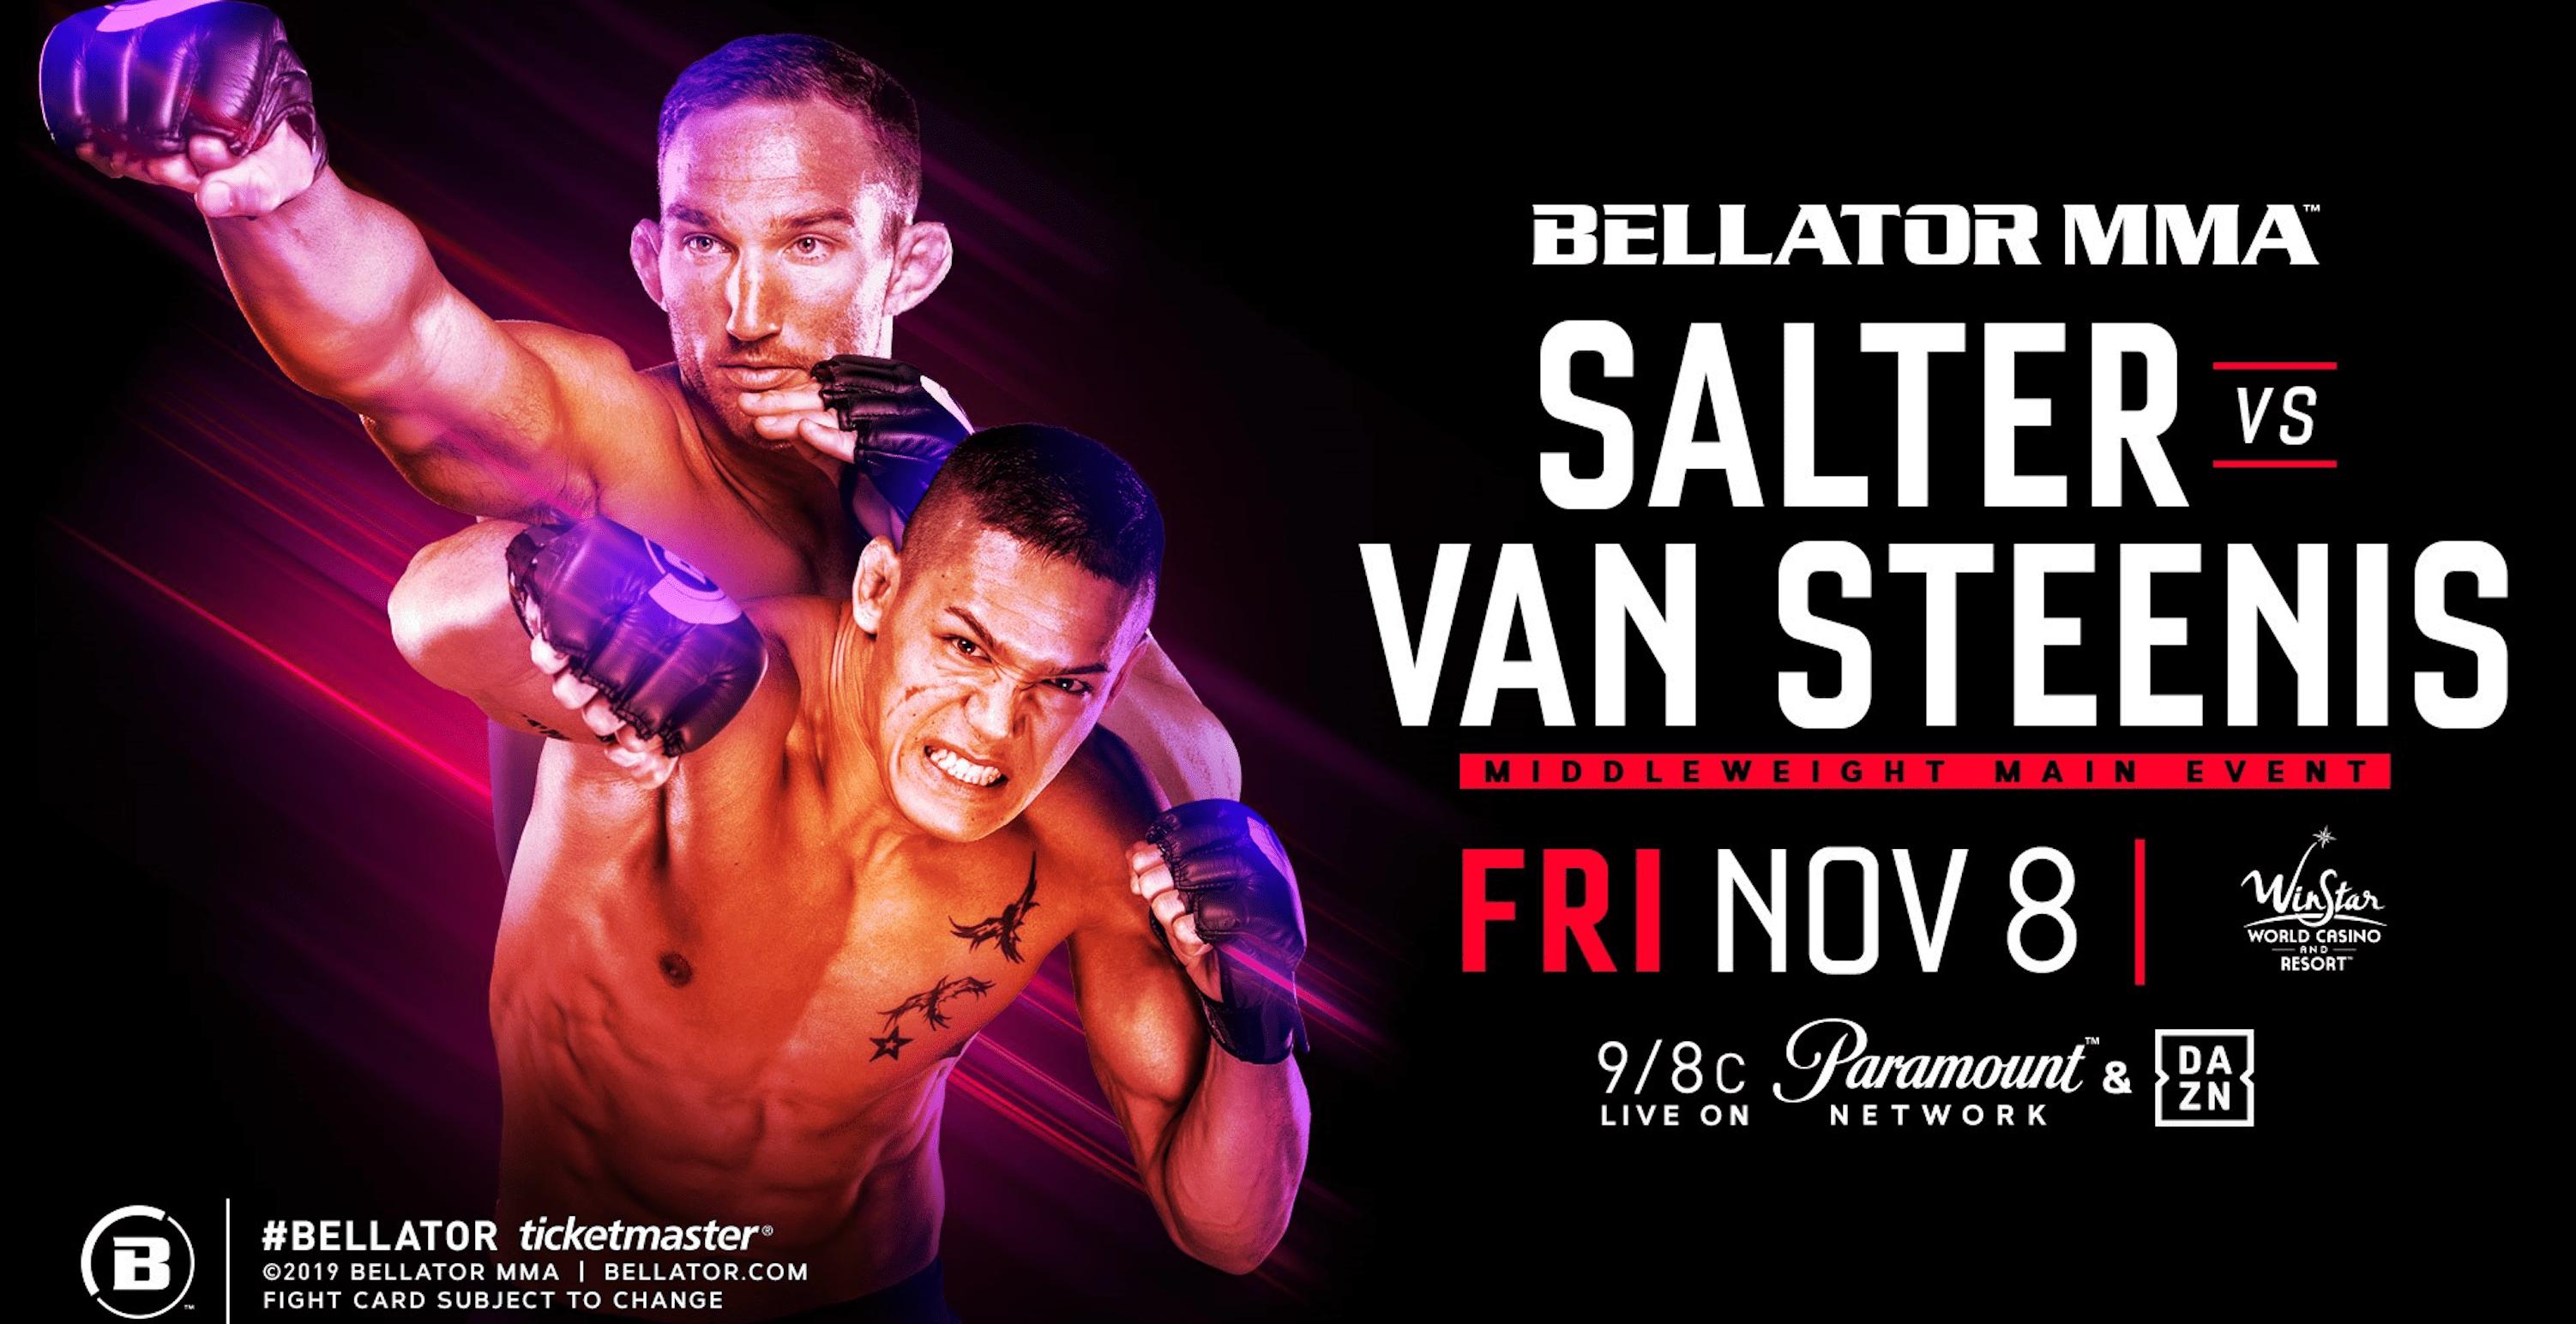 Bellator 233: Salter vs Van Steenis Results